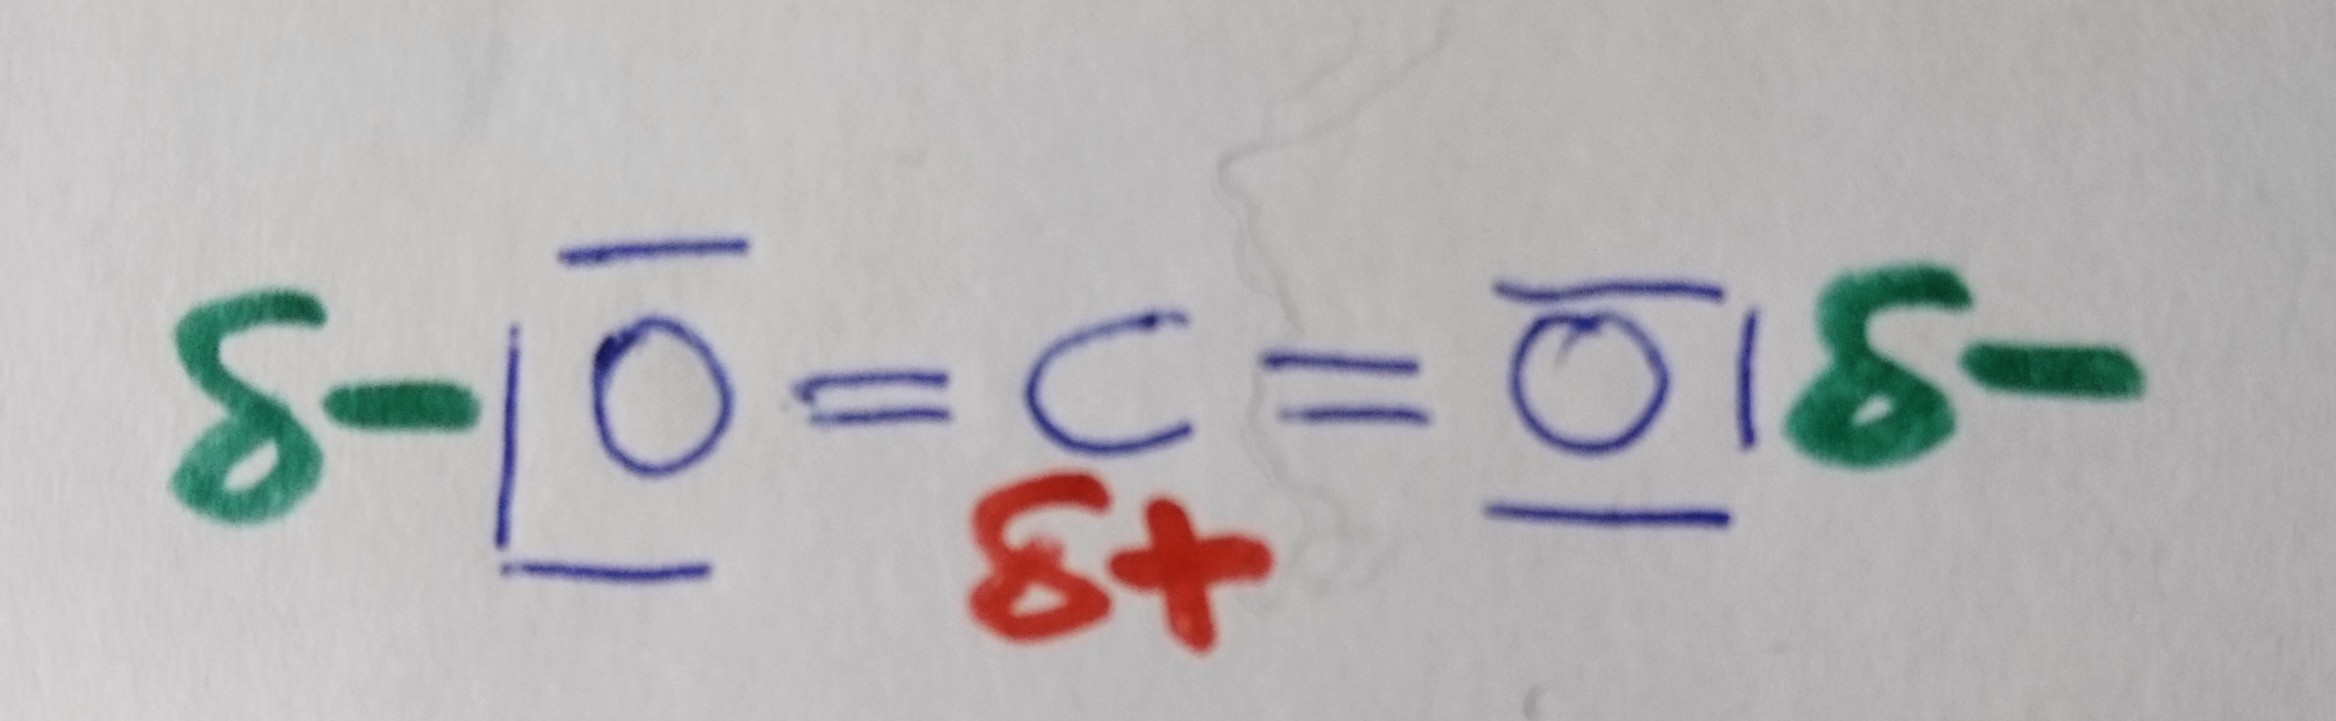 Kohlenstoffdioxid